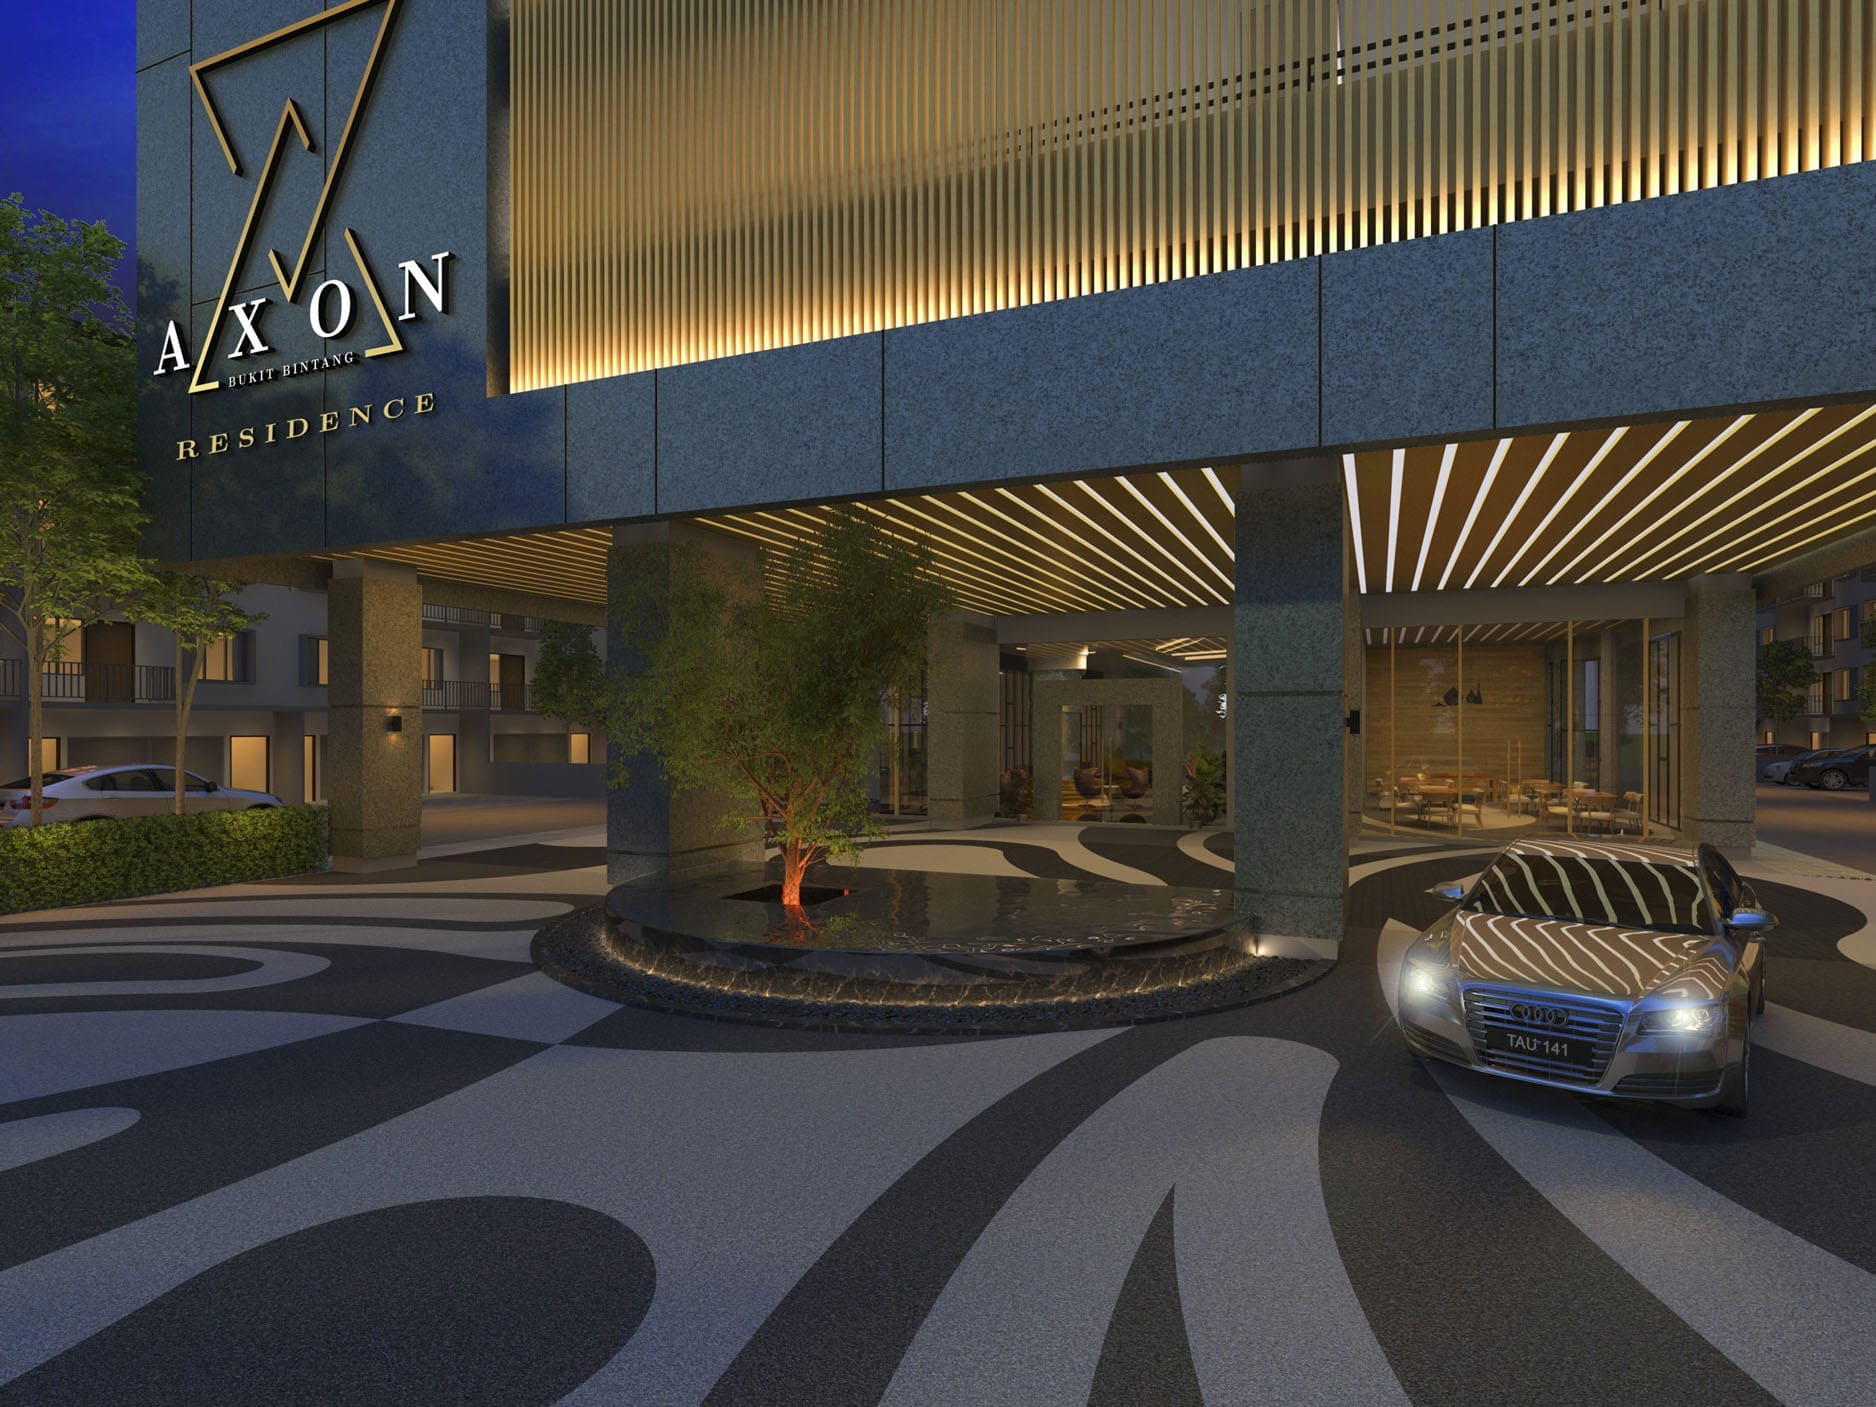 Axon Bukit Bintang Image 08